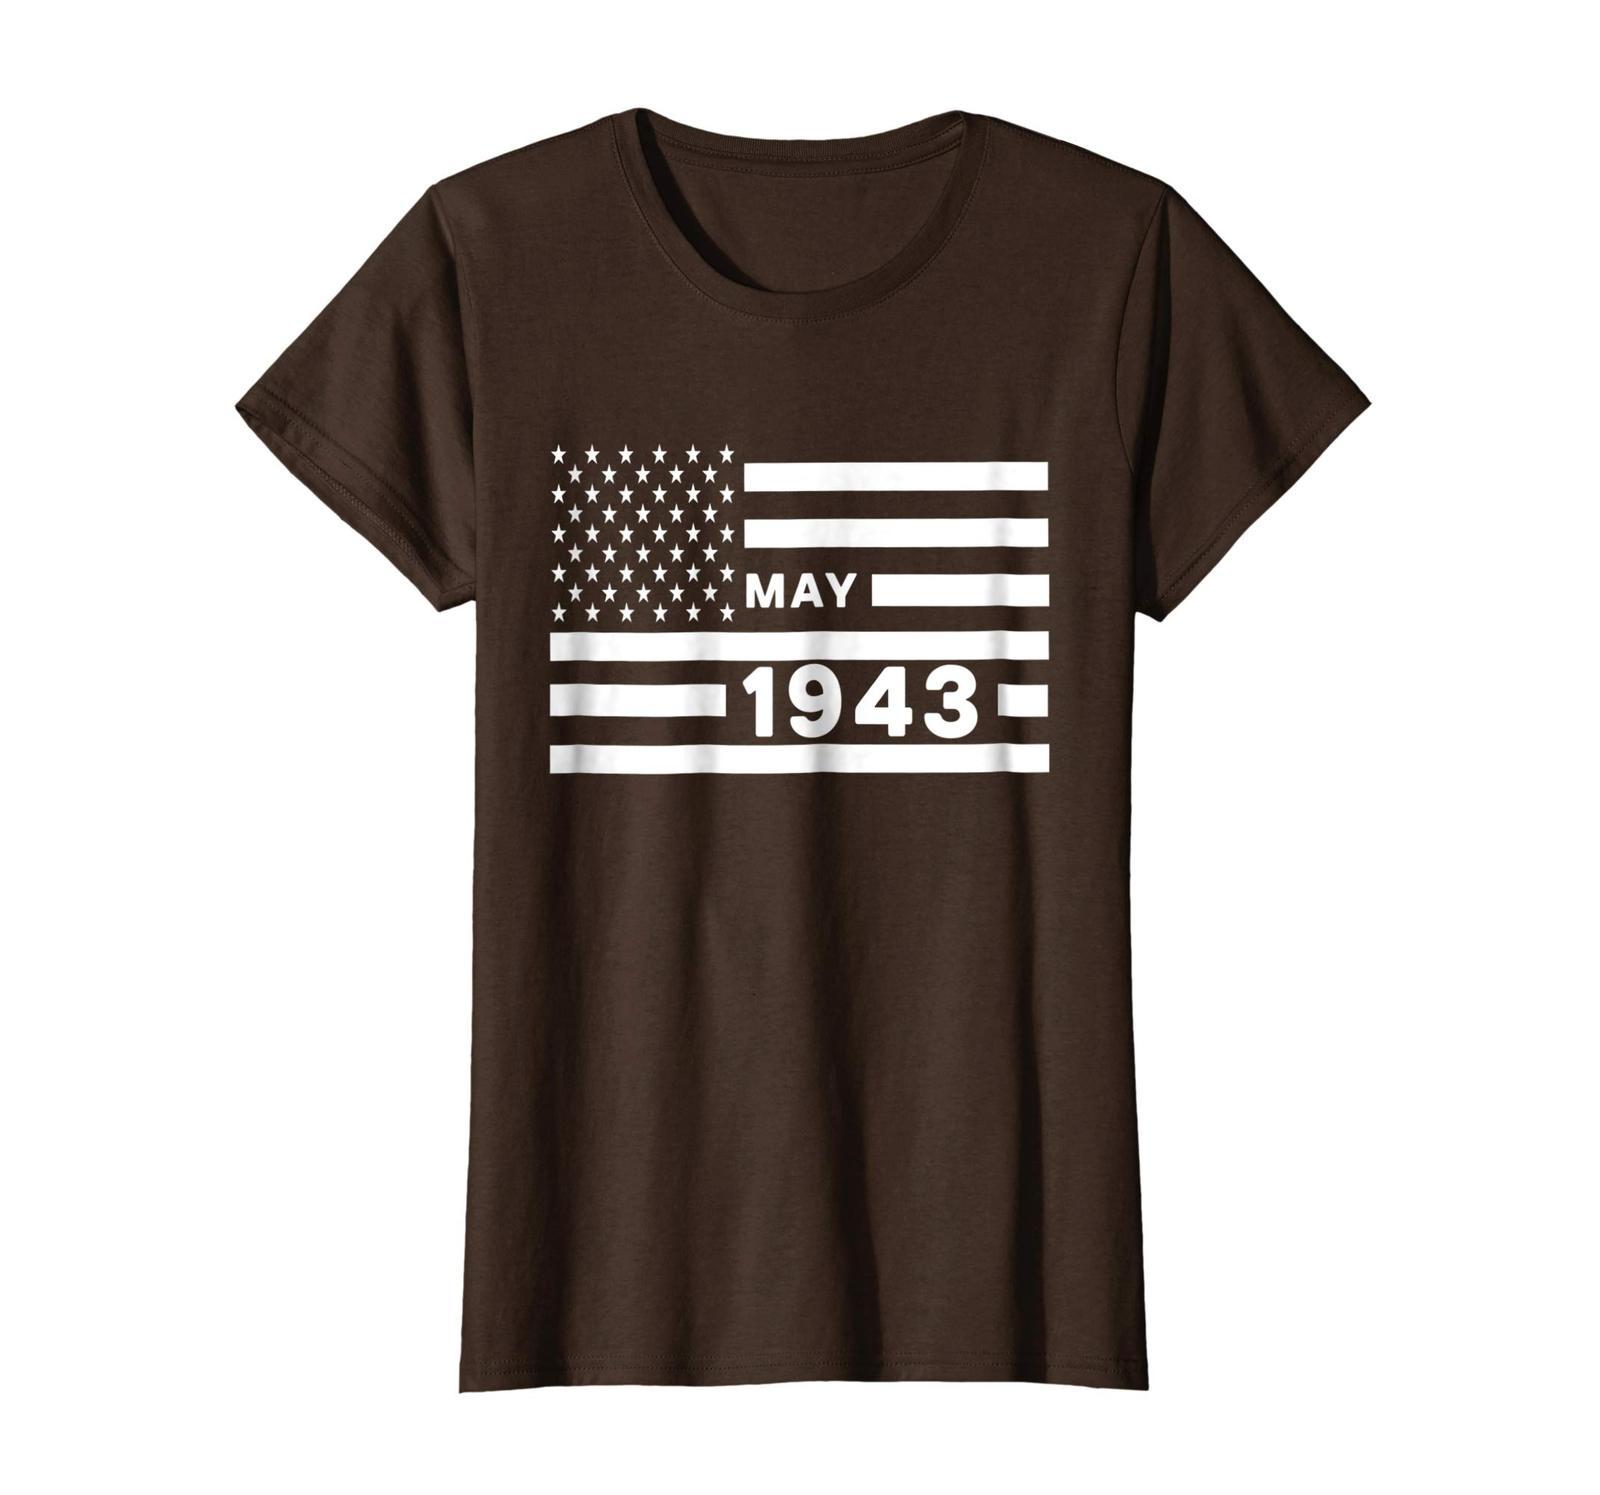 Dad Shirts -  America Flag May 1943 75th Year Old Birthday Shirt Gift Wowen image 4